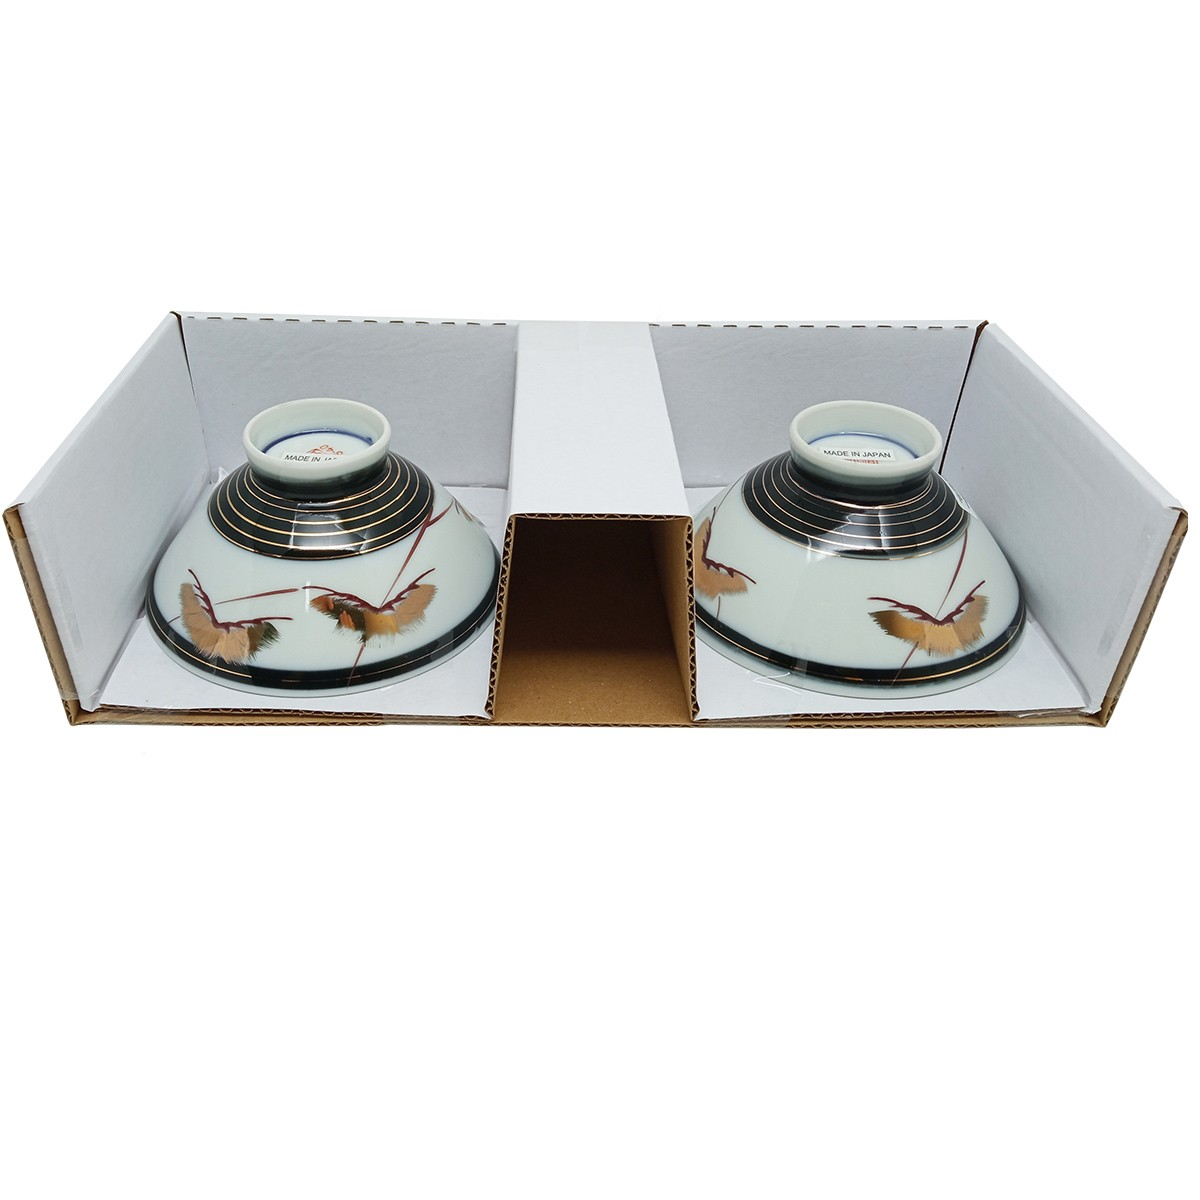 Jogo de Tigelas de Cerâmica Japonesas M/M